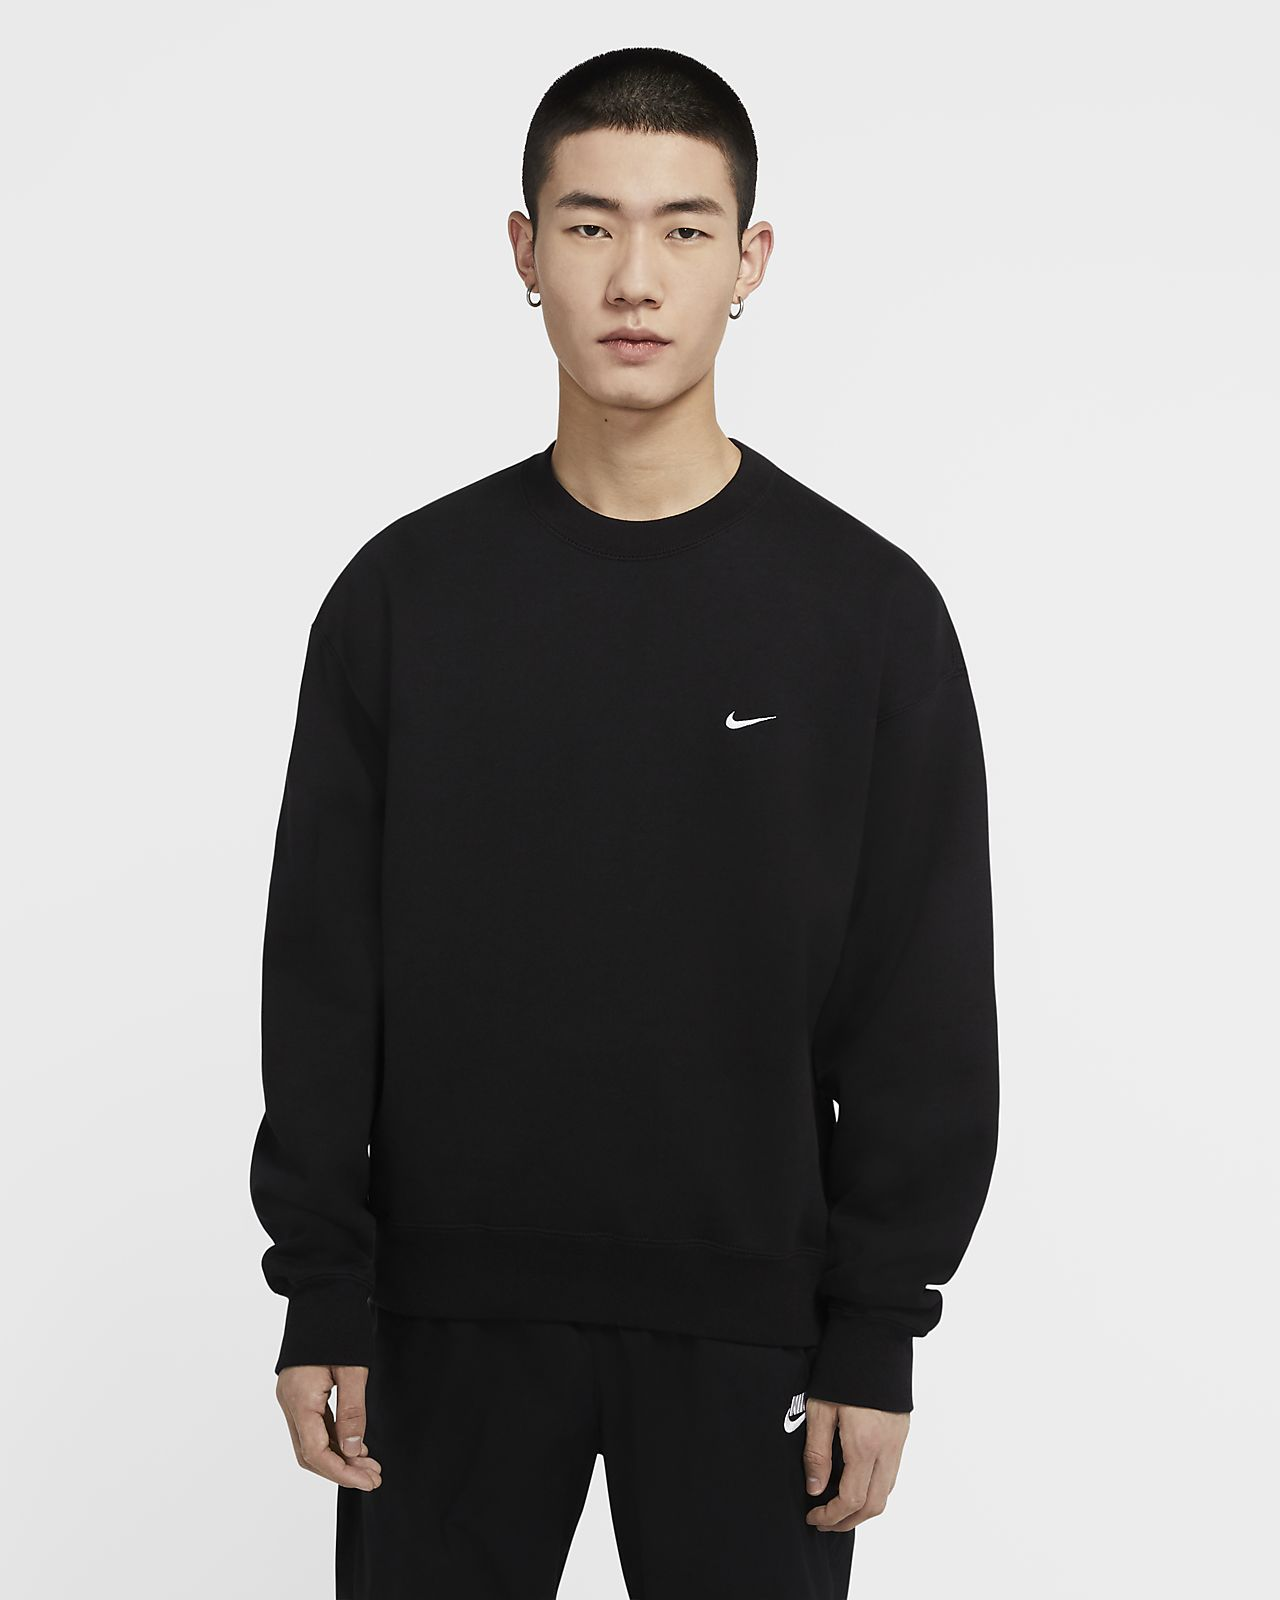 NikeLab 男子起绒圆领上衣